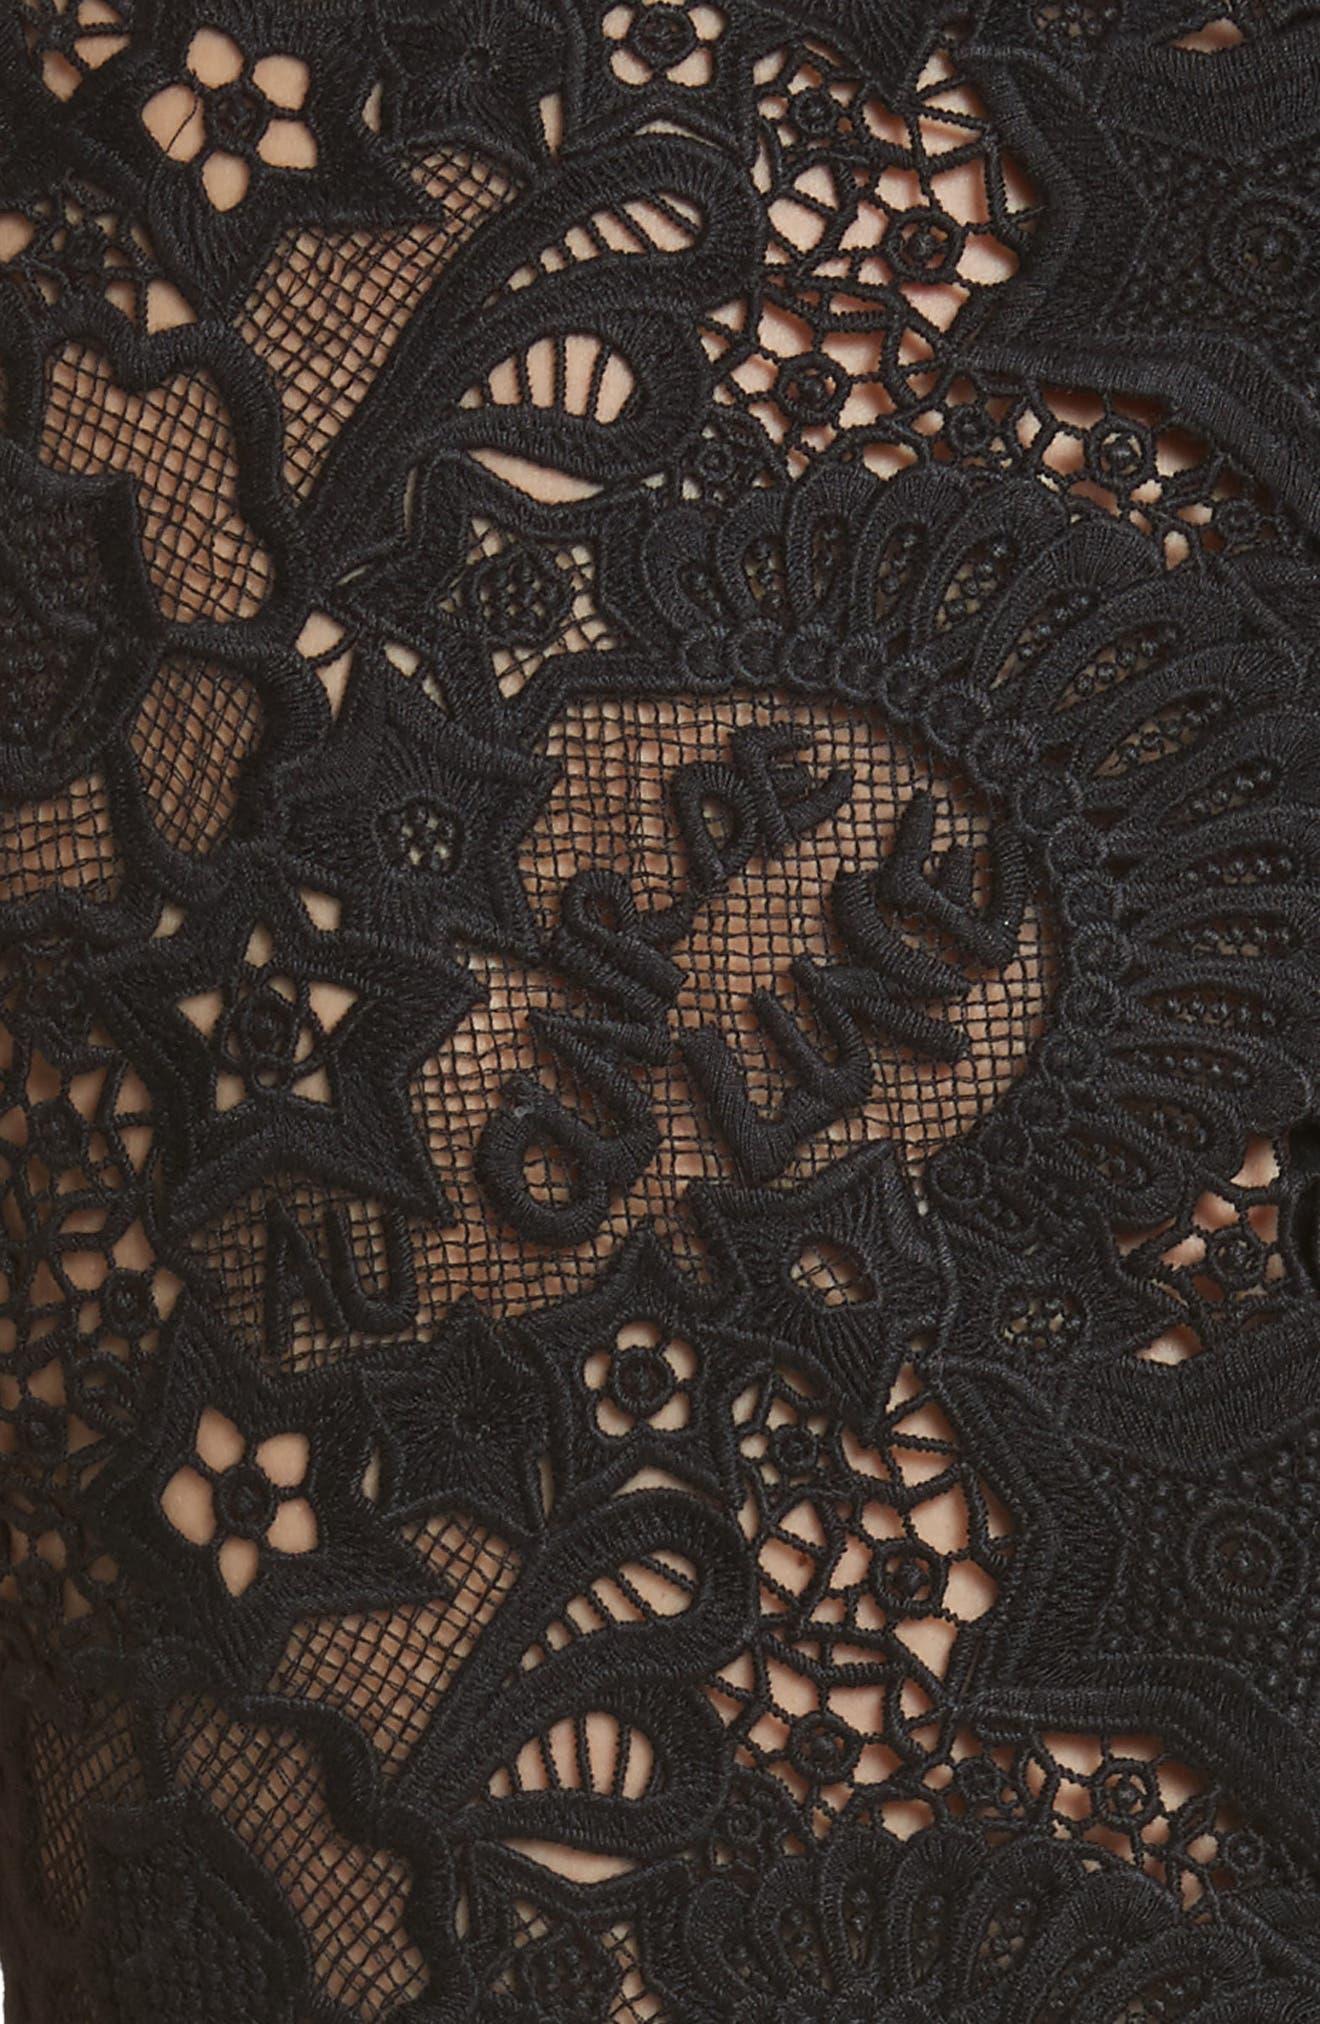 Lace Back Crepe & Tweed Dress,                             Alternate thumbnail 5, color,                             Black